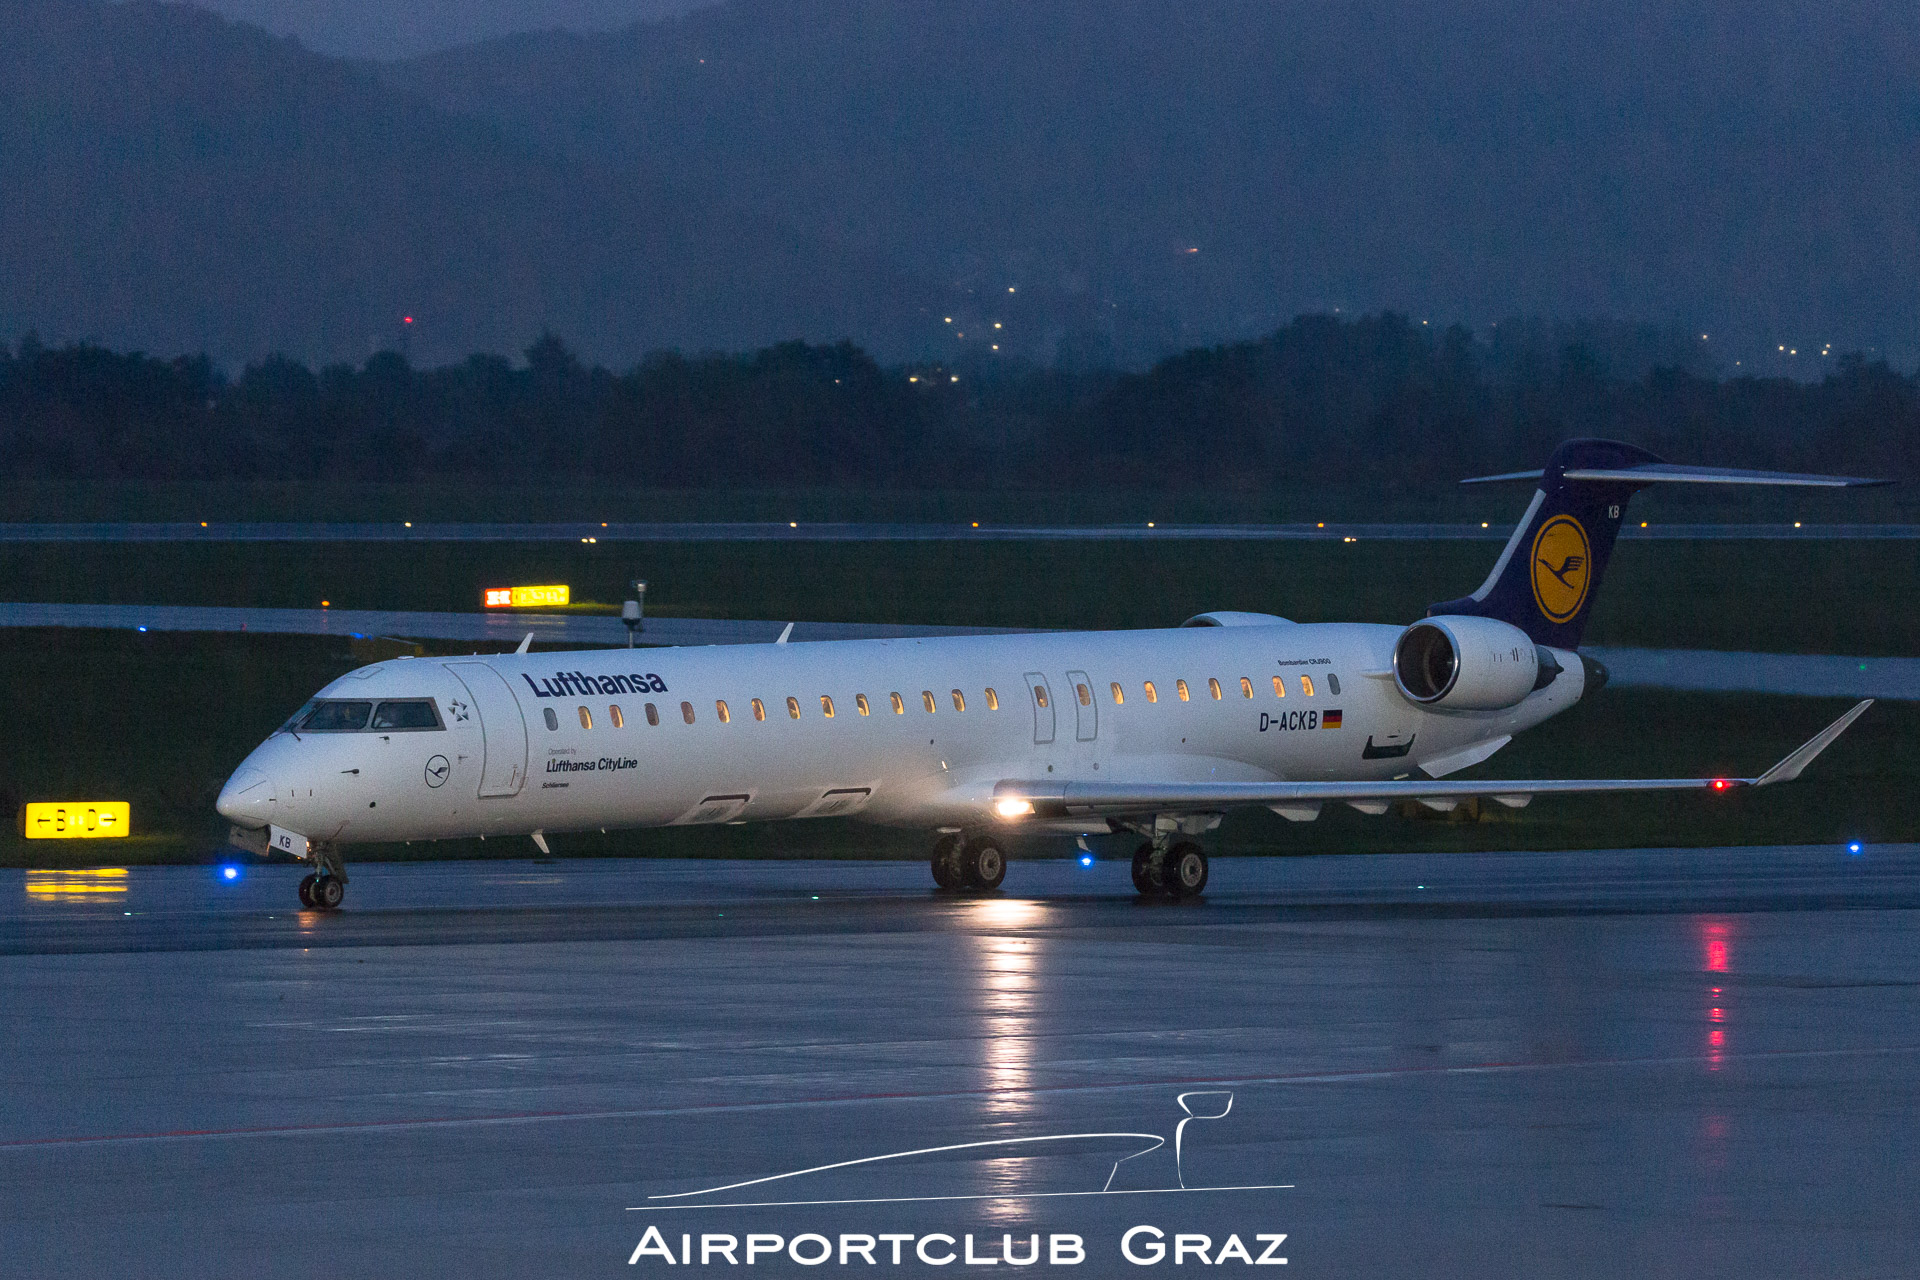 Lufthansa Cityline CRJ-900 D-ACKB